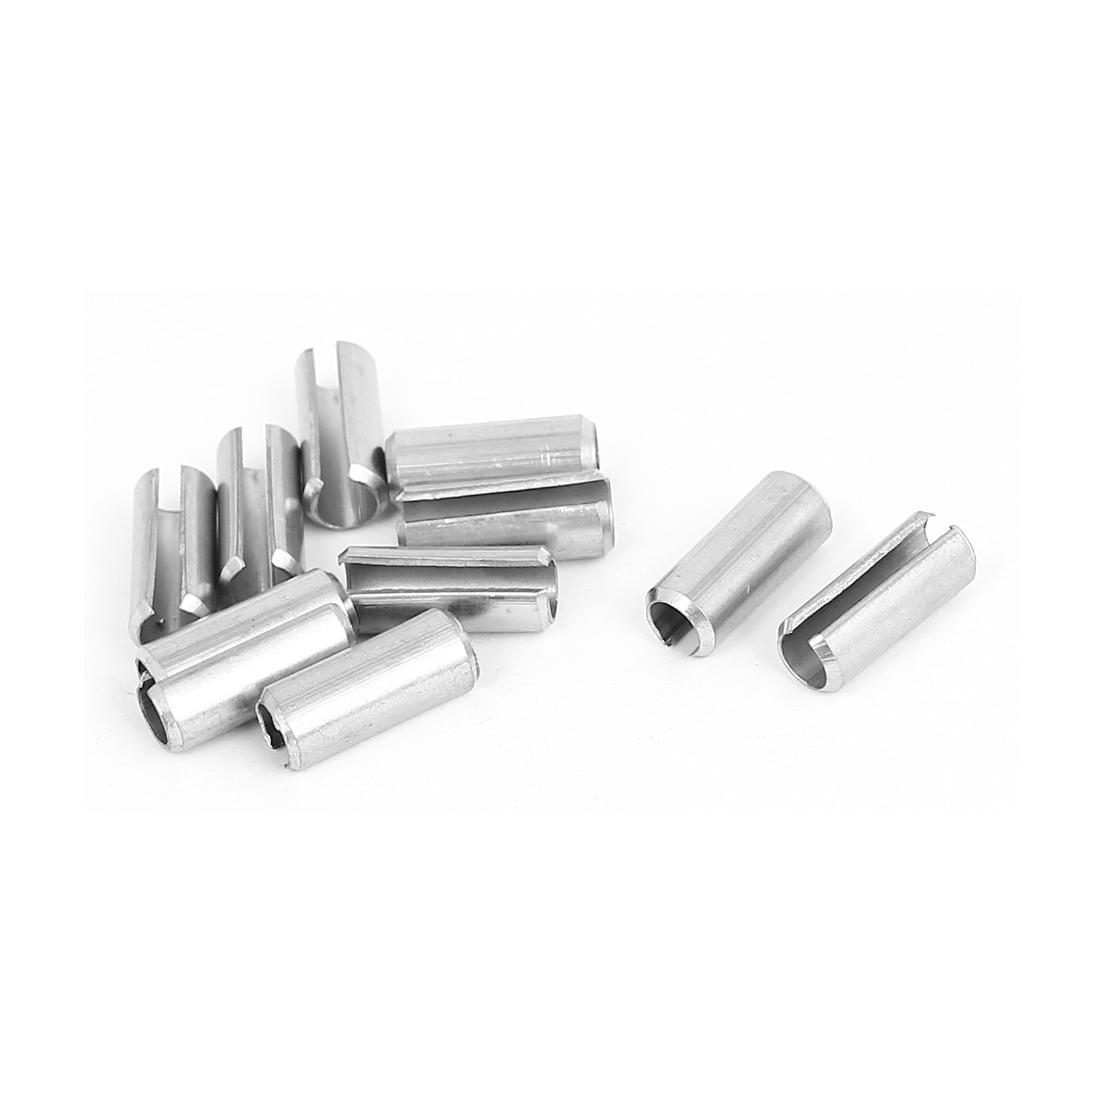 M6x16mm Stainless Steel Split Spring Roll Dowel Pins Fasteners 10Pcs